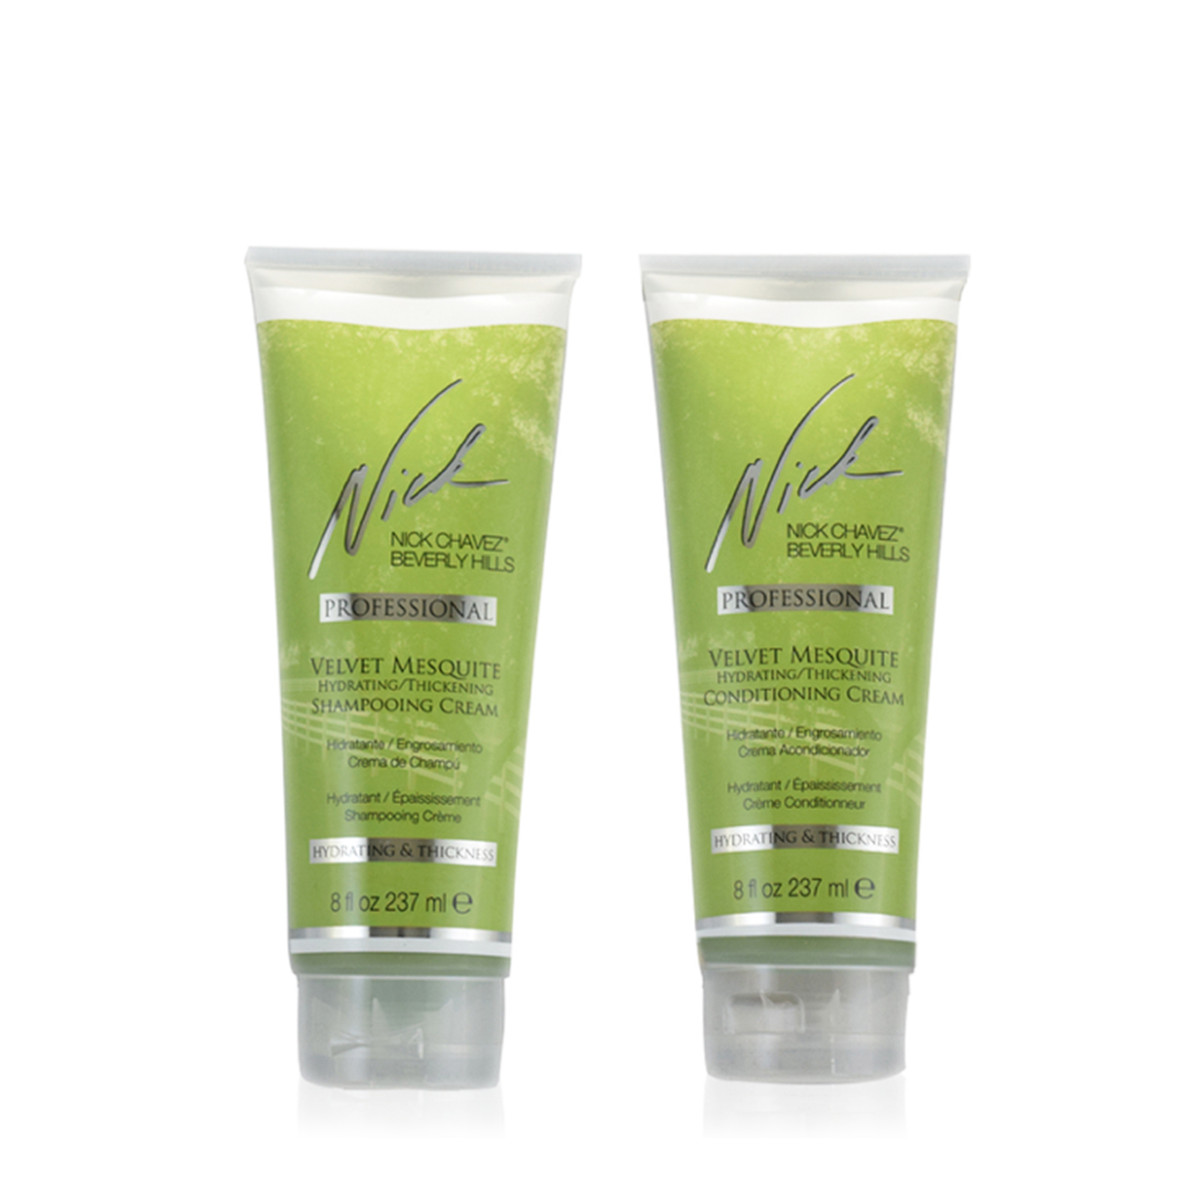 Velvet Mesquite Shampoo & Conditioner Duo 8oz